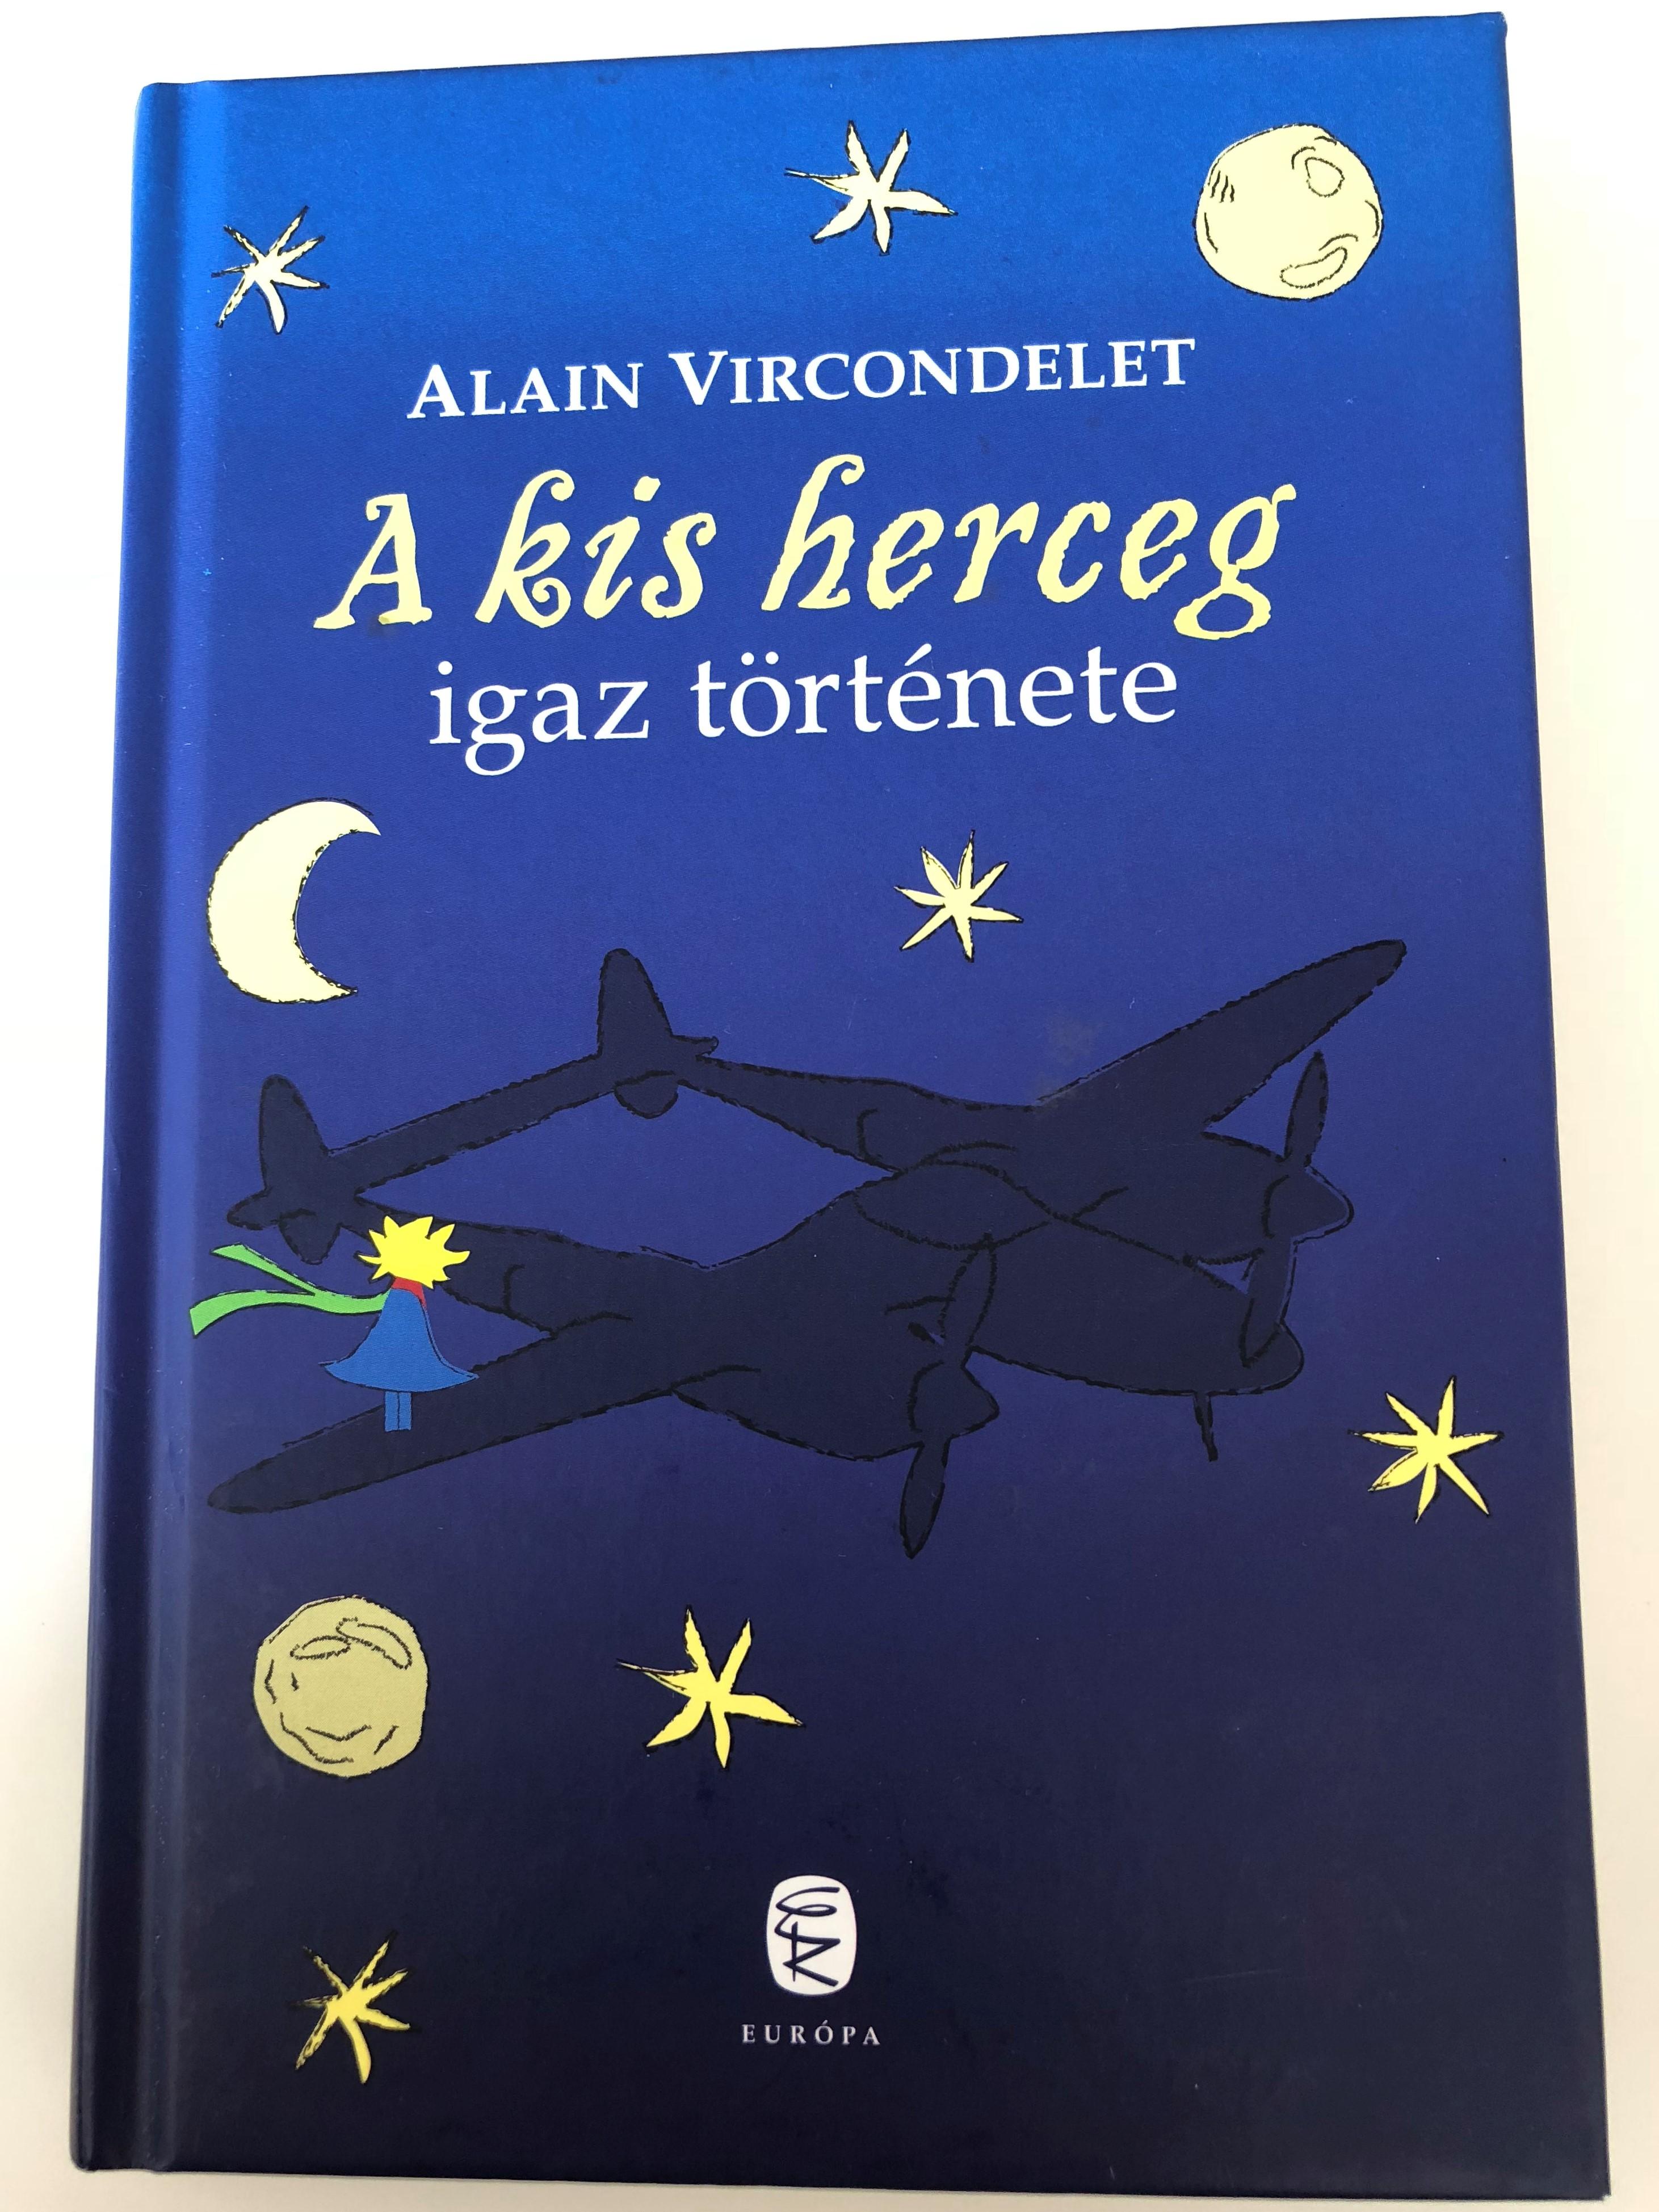 a-kis-herceg-igaz-t-rt-nete-by-alain-vircondelet-hungarian-translation-of-le-v-ritable-historie-du-petit-prince-hardcover-2010-eur-pa-kiad-1-.jpg